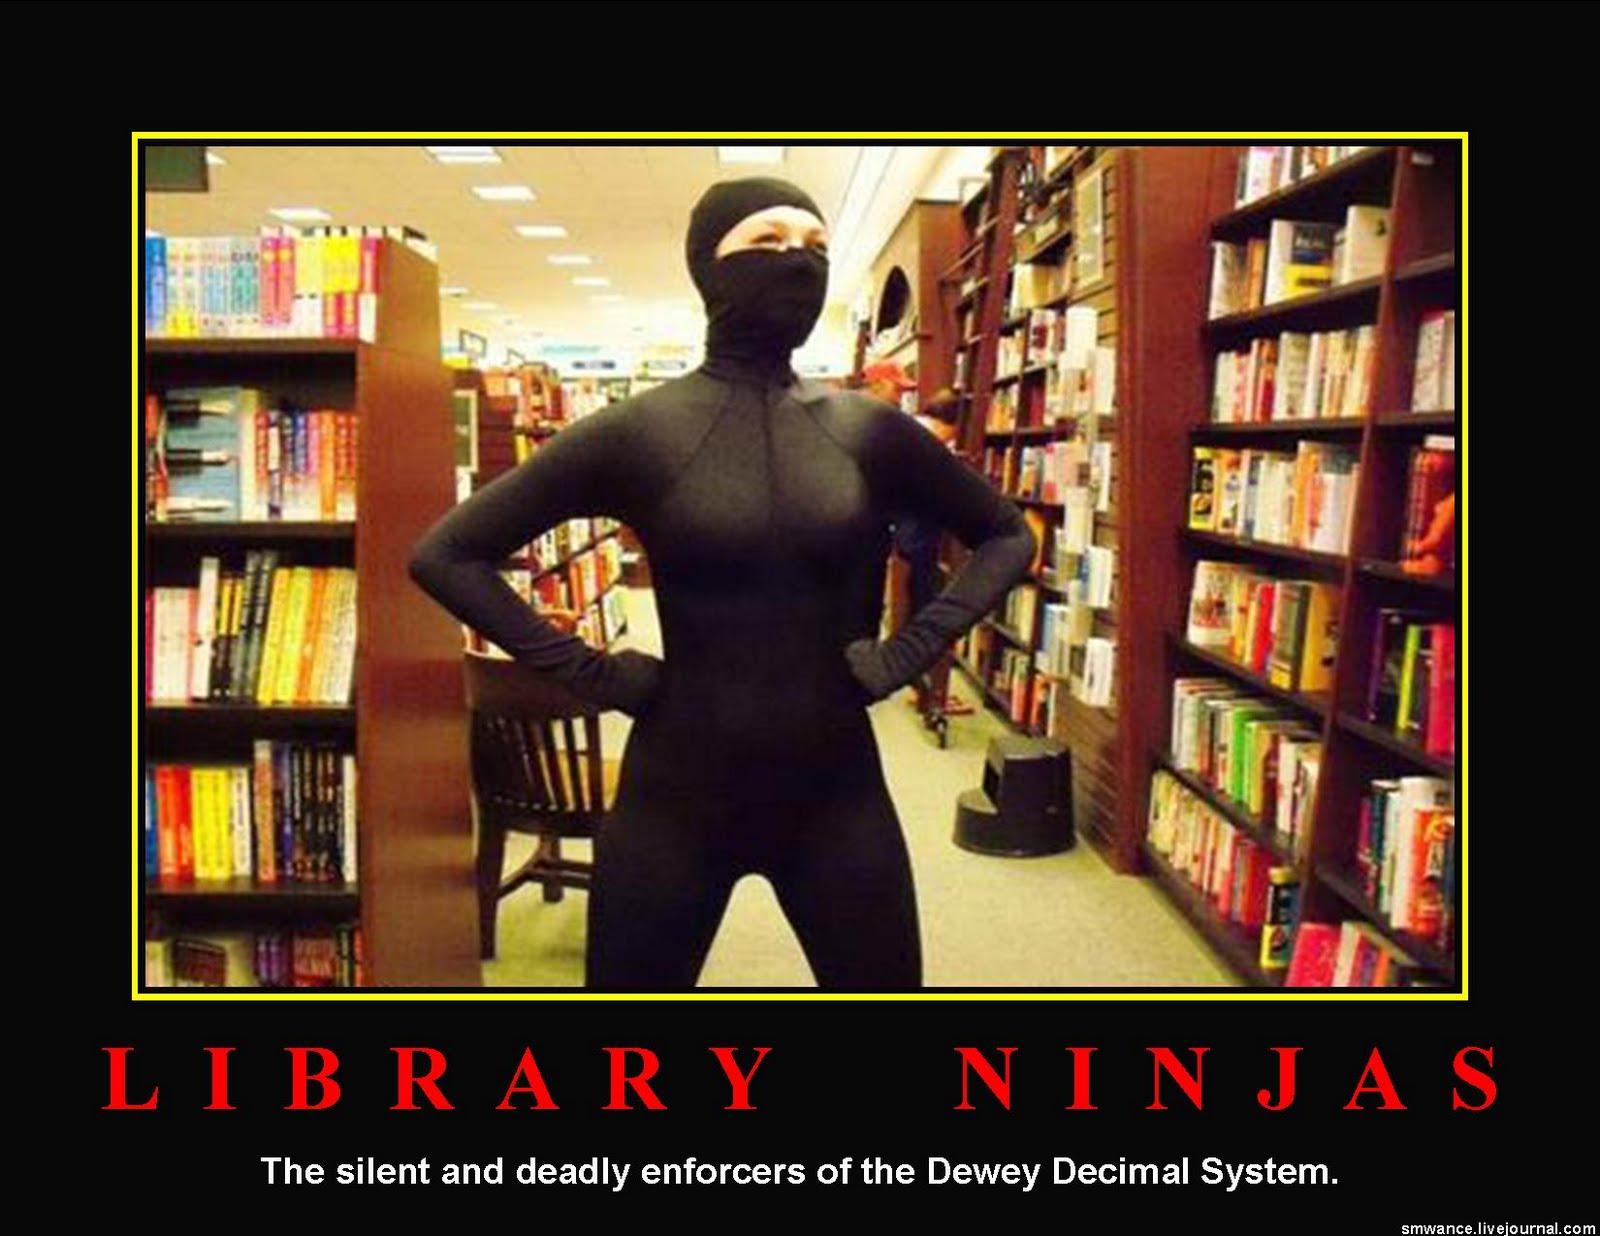 Flaming Zombie Monkeys: Library Ninjas Week Of September 20 2010 Photos